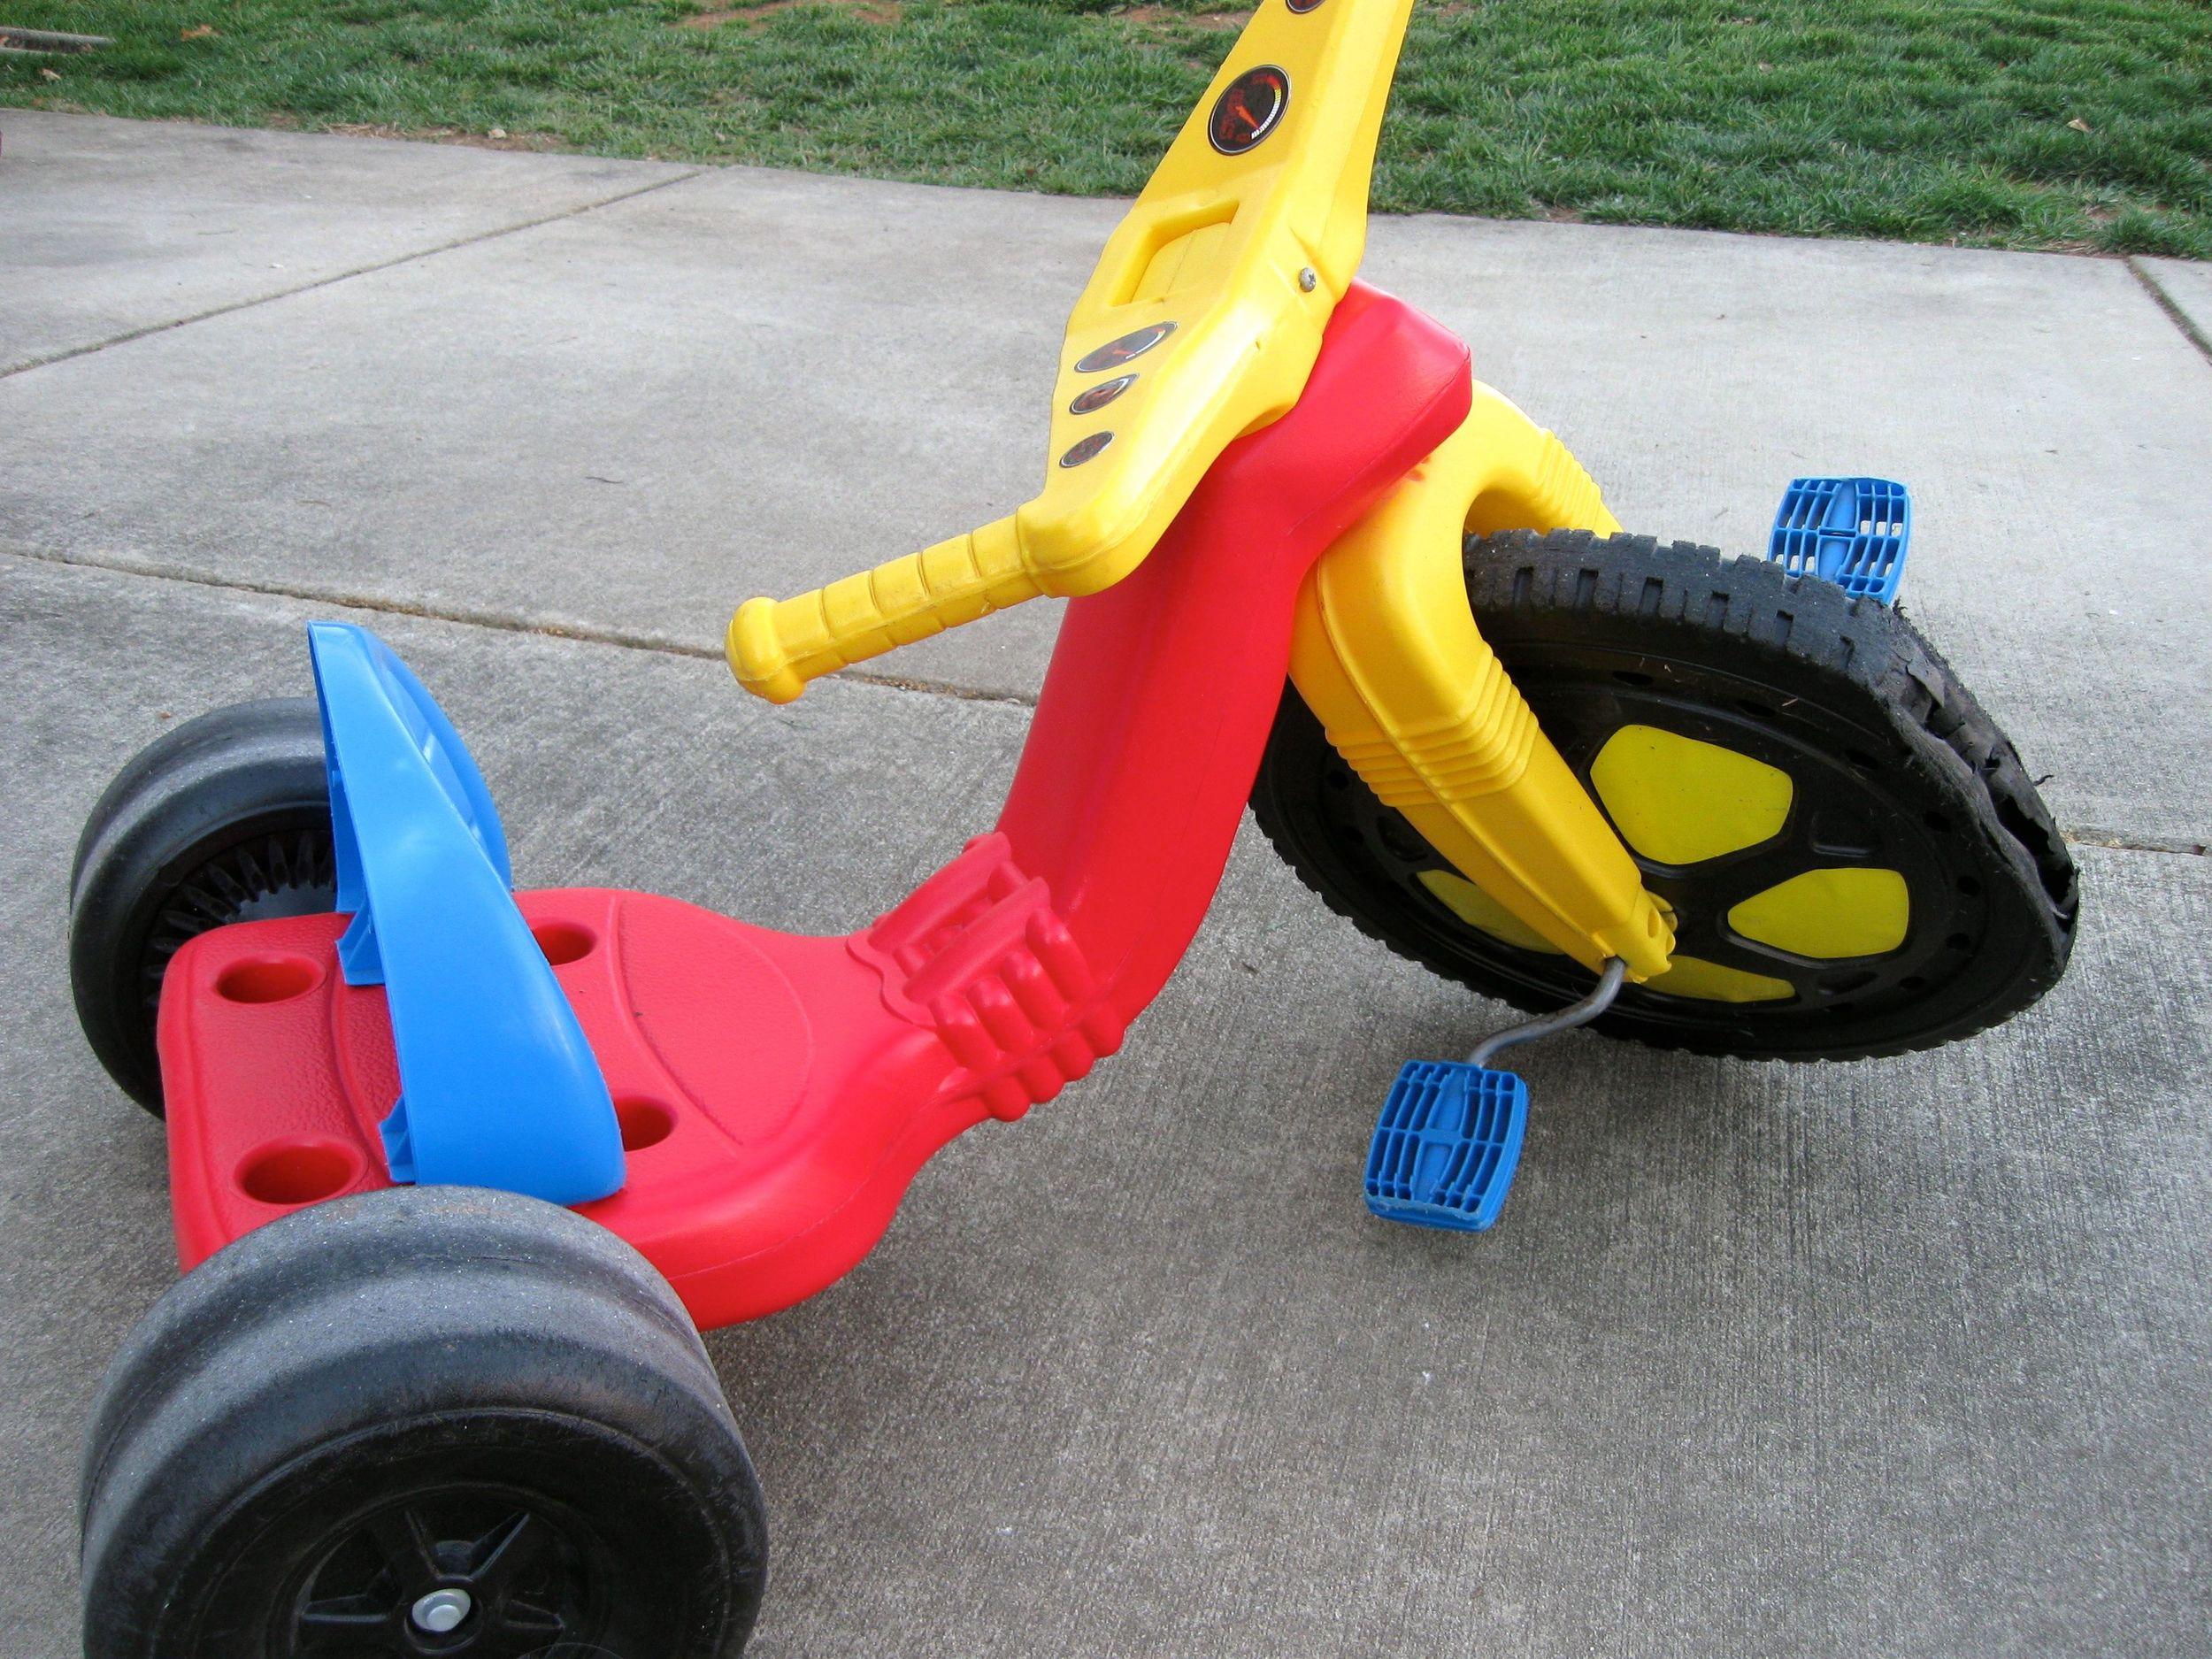 2.2 Big Wheel – © Karen Brewer Grossman, mominthemuddle.com/tag/memories/ by